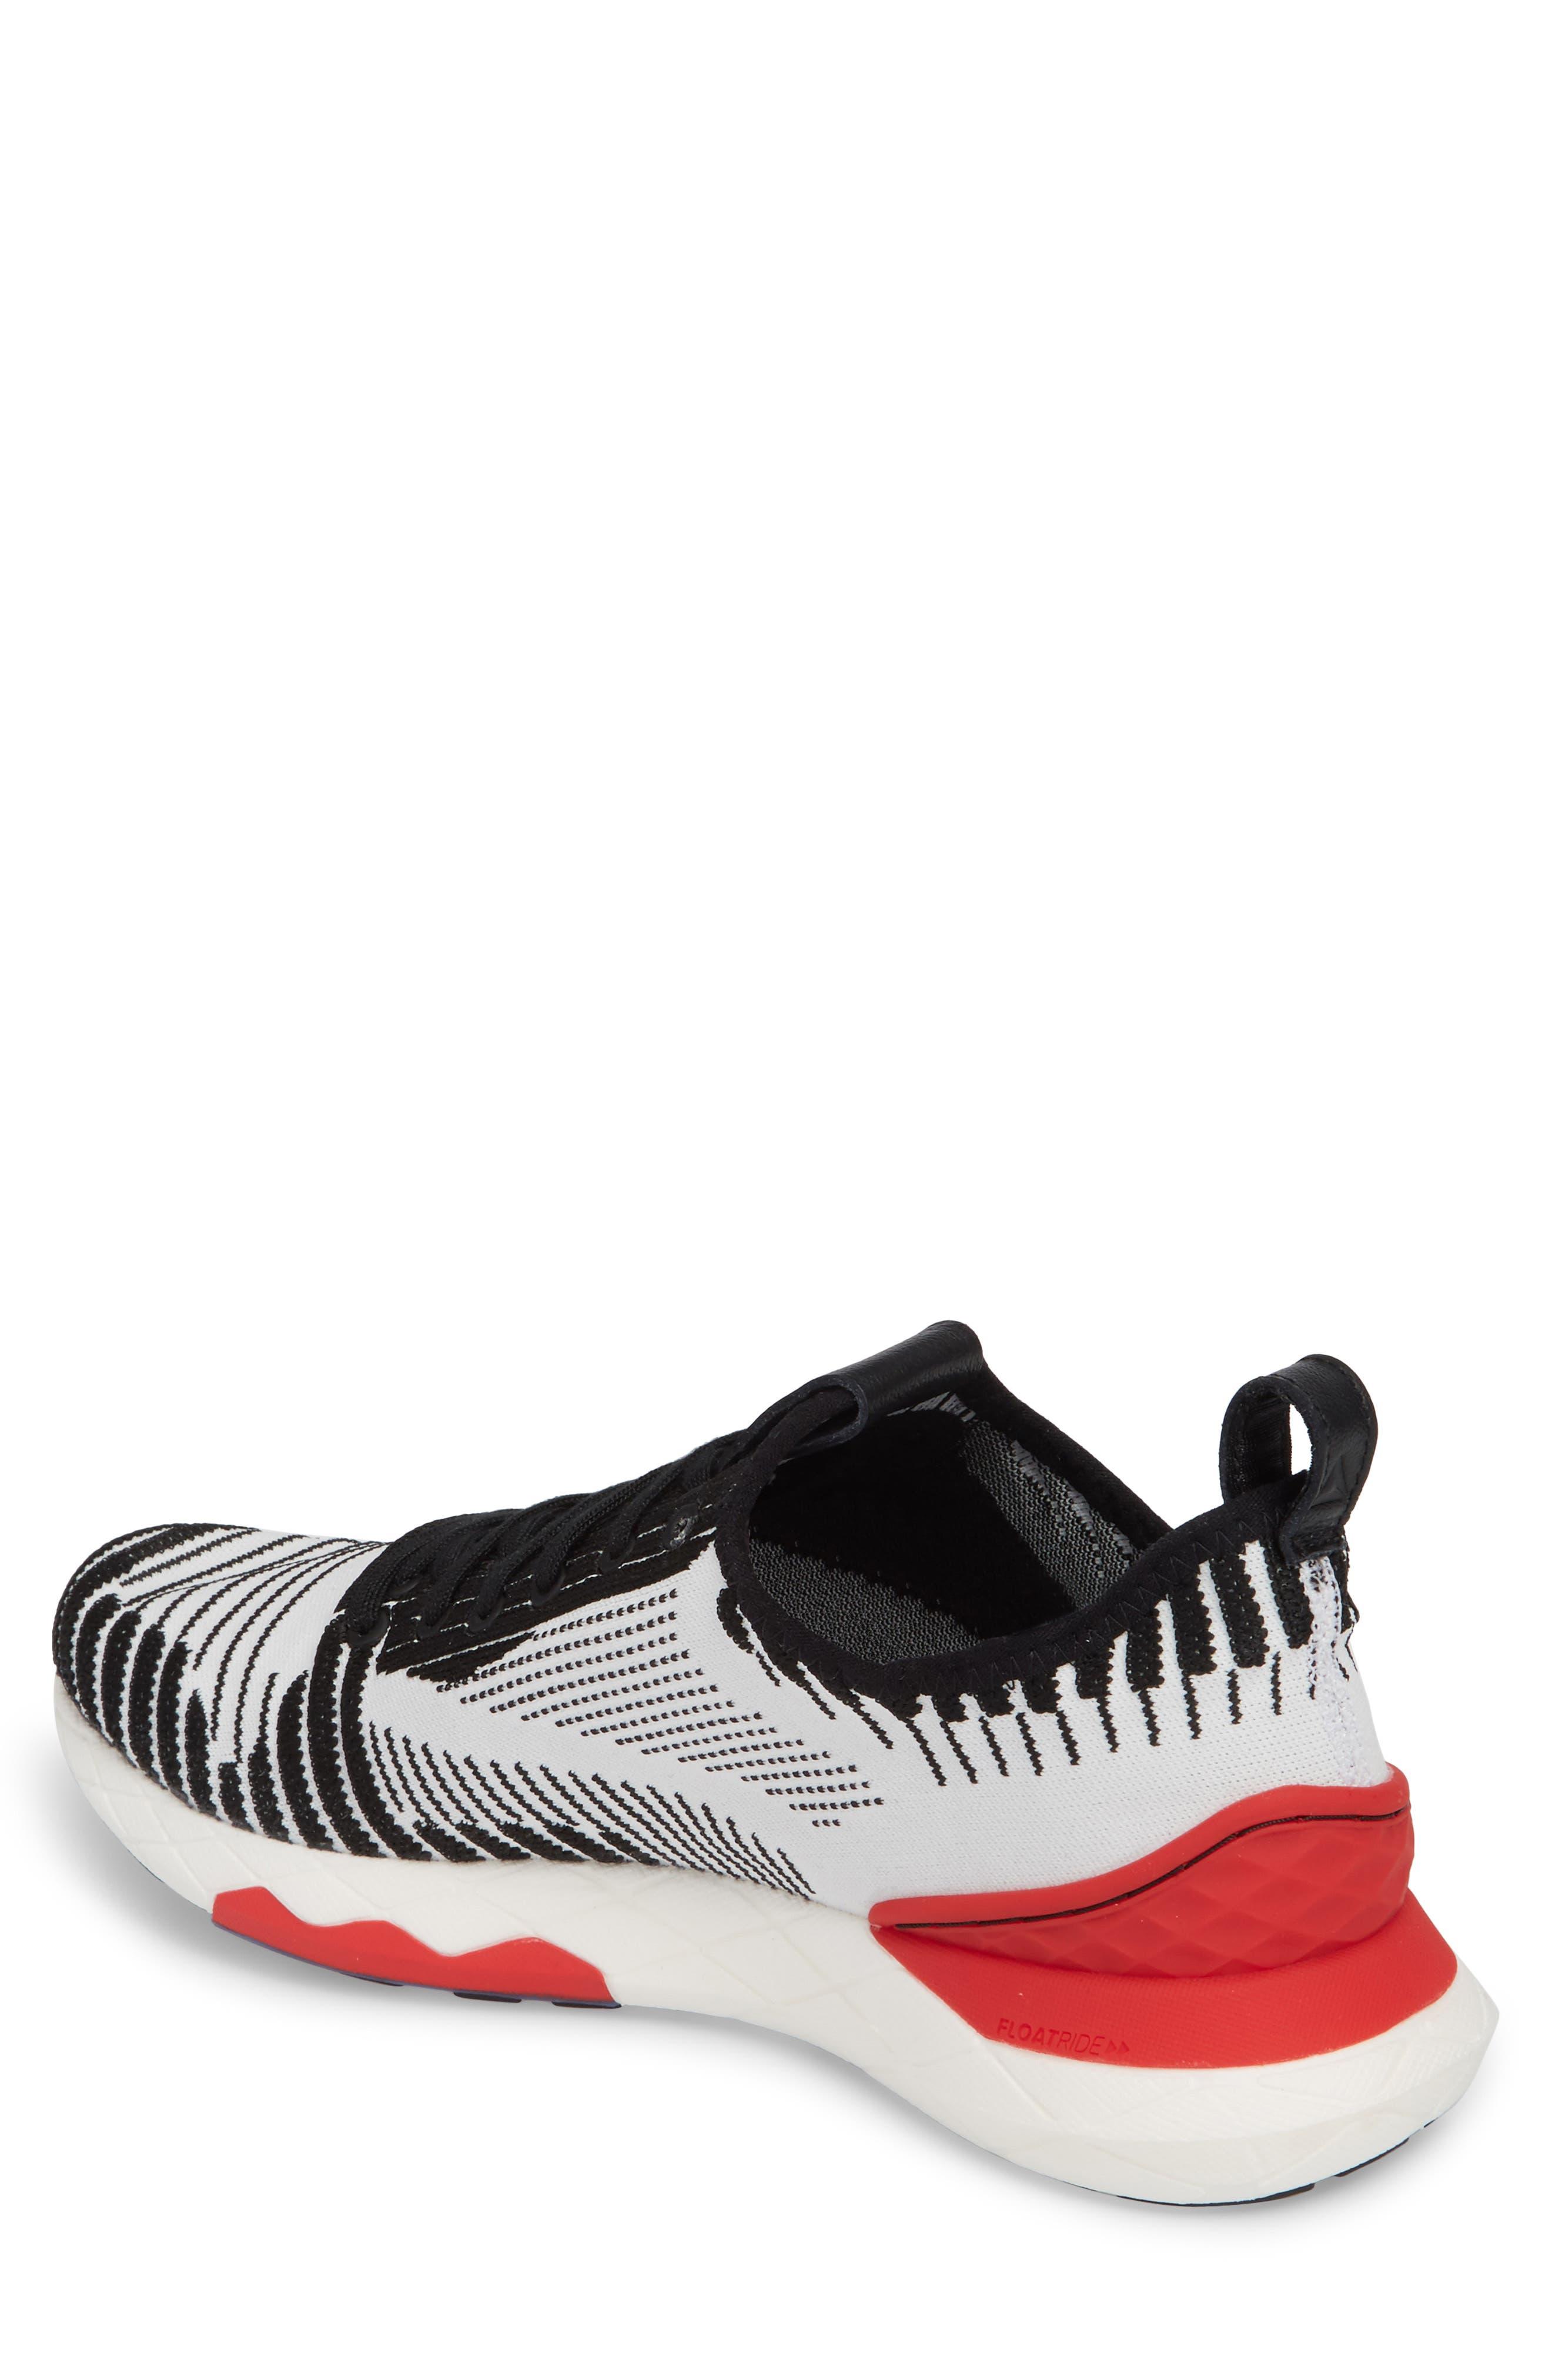 Floatride Run 6000 Running Shoe,                             Alternate thumbnail 2, color,                             001